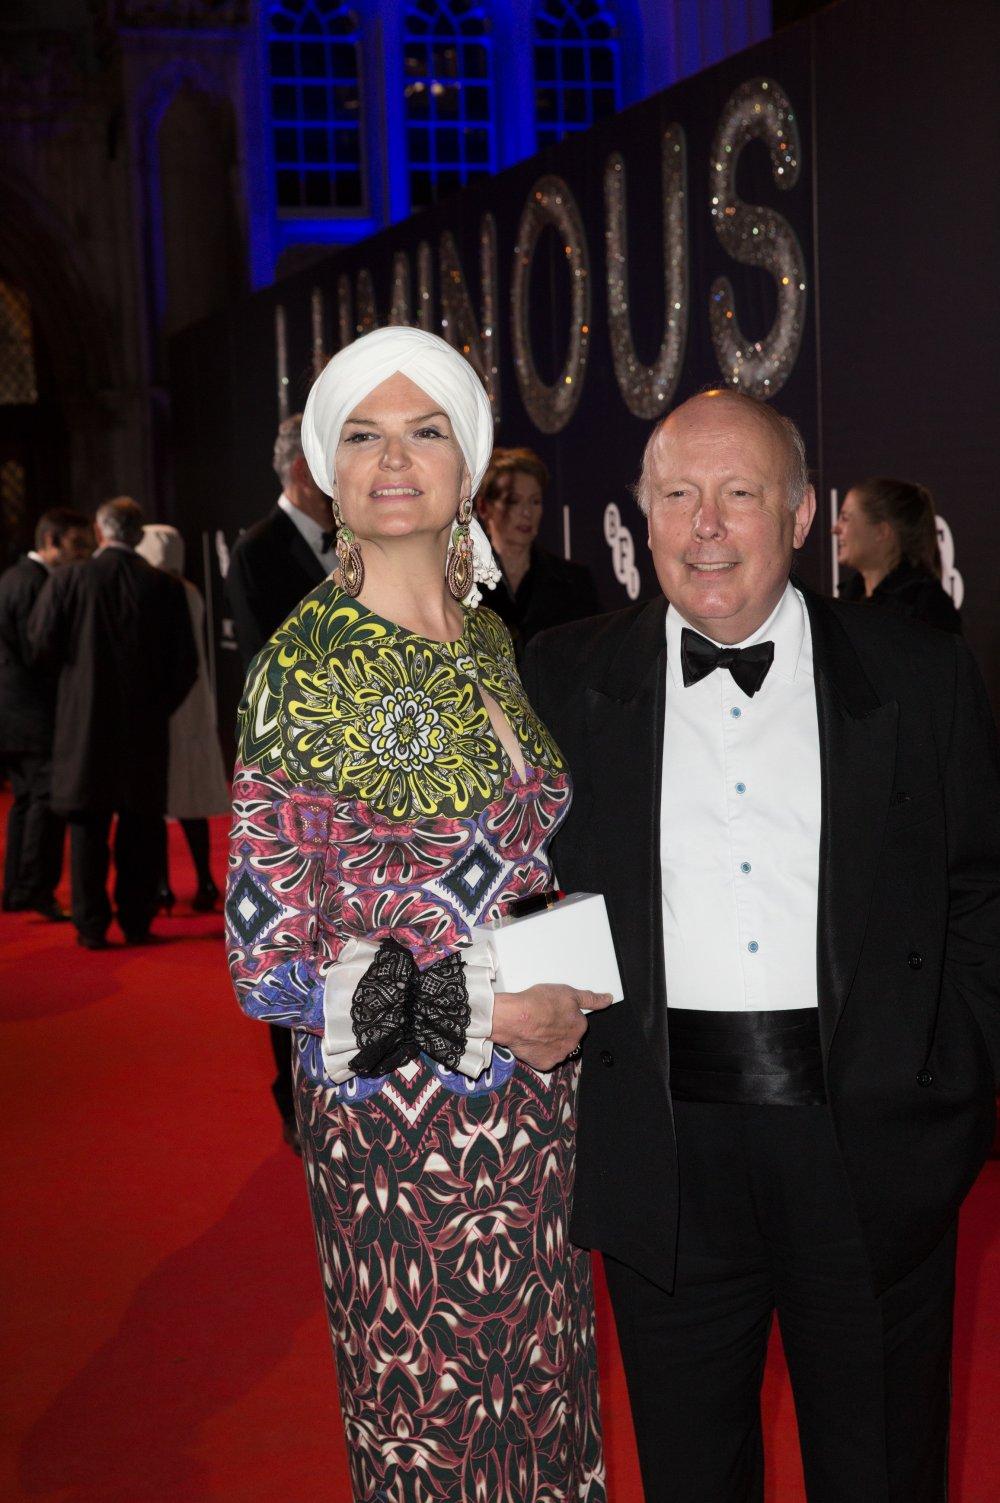 Julian Fellowes attends the BFI LUMINOUS gala 2015